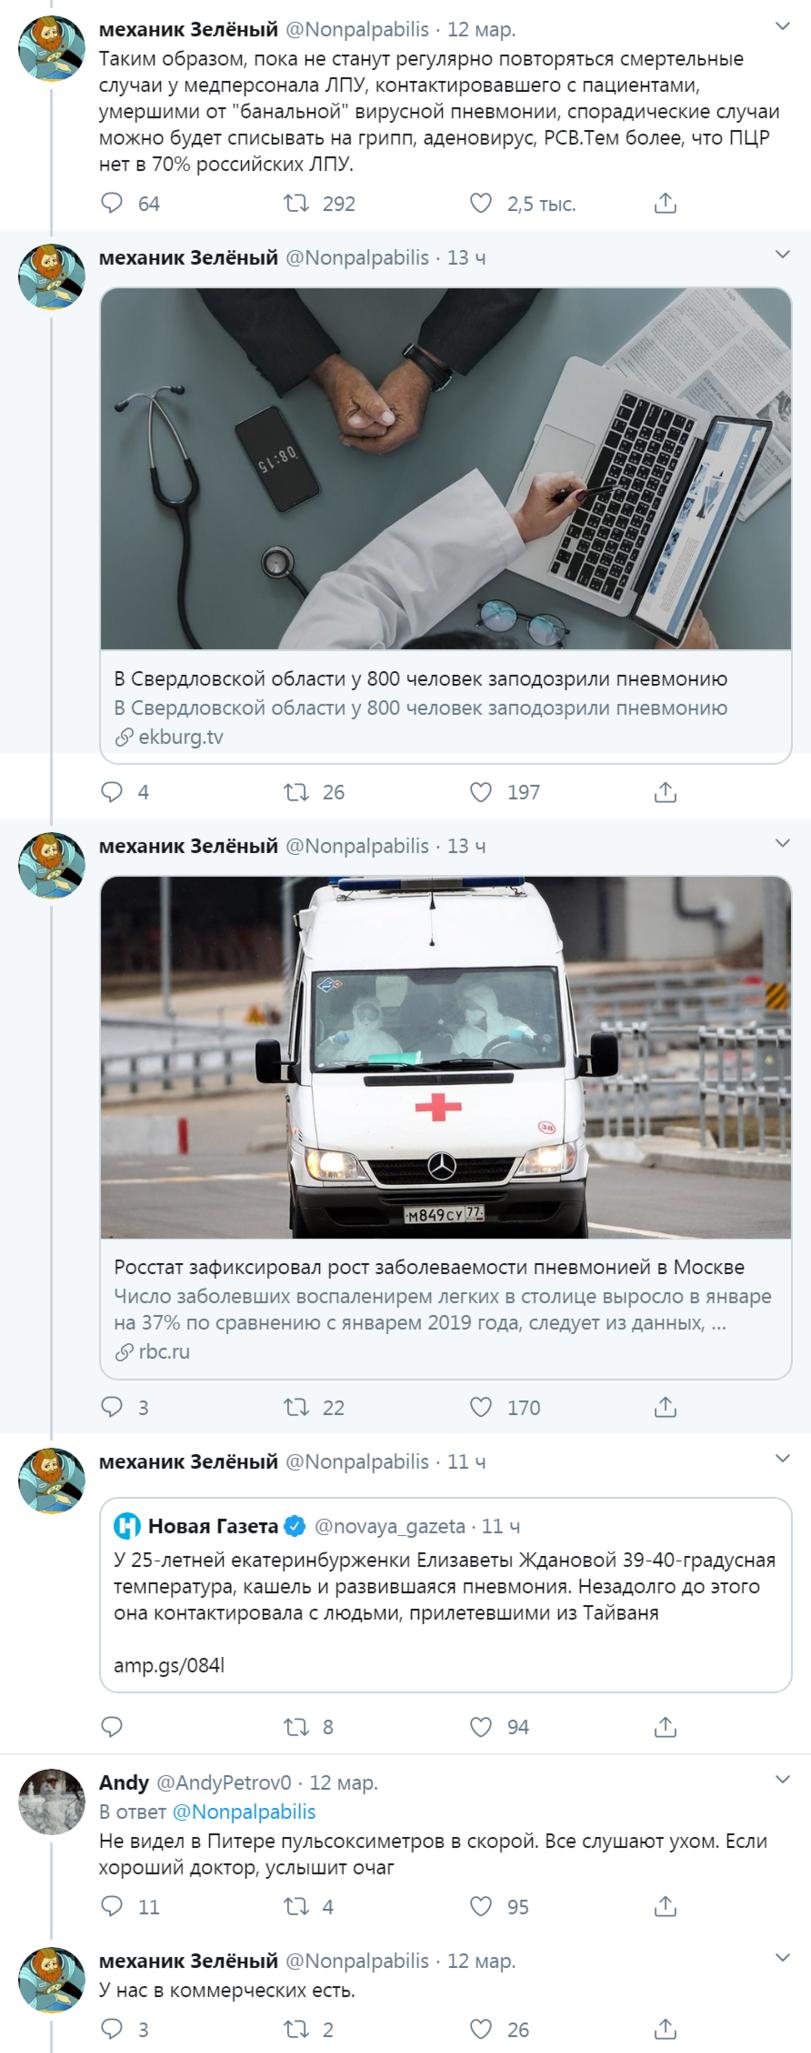 https://cs11.pikabu.ru/post_img/big/2020/03/14/8/1584193763197164505.png